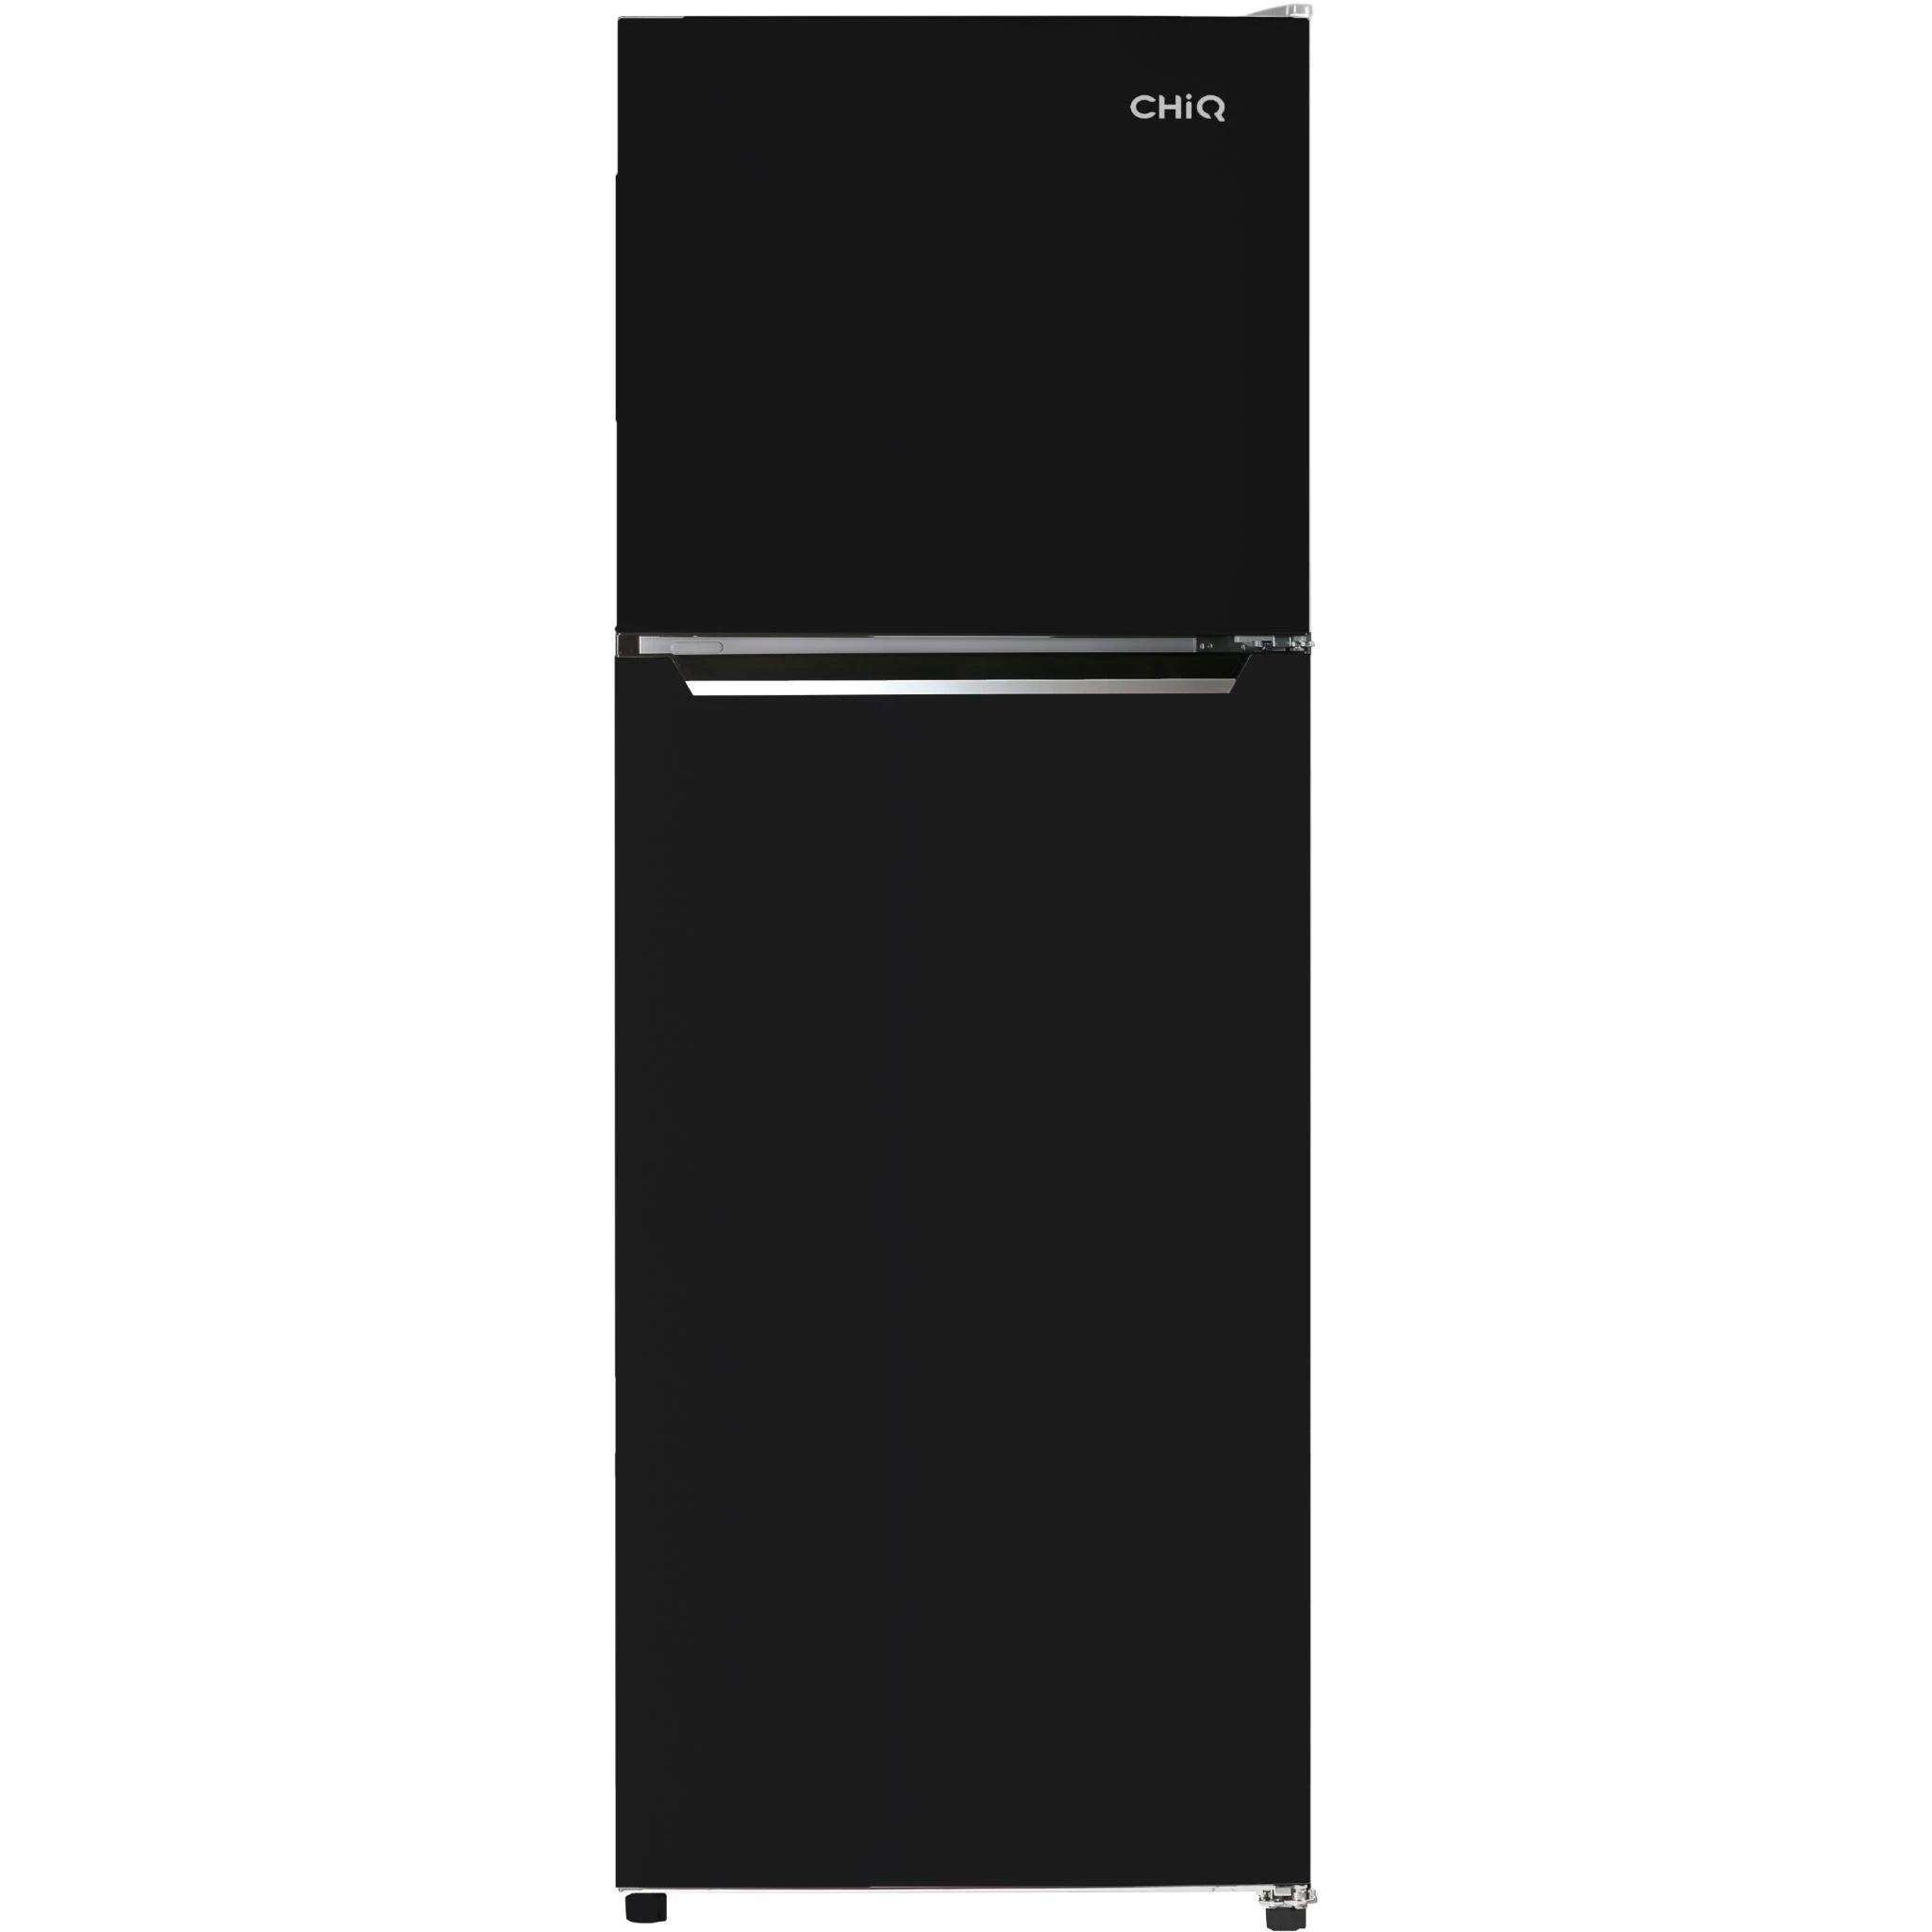 CHiQ CTM368BP Refrigerator